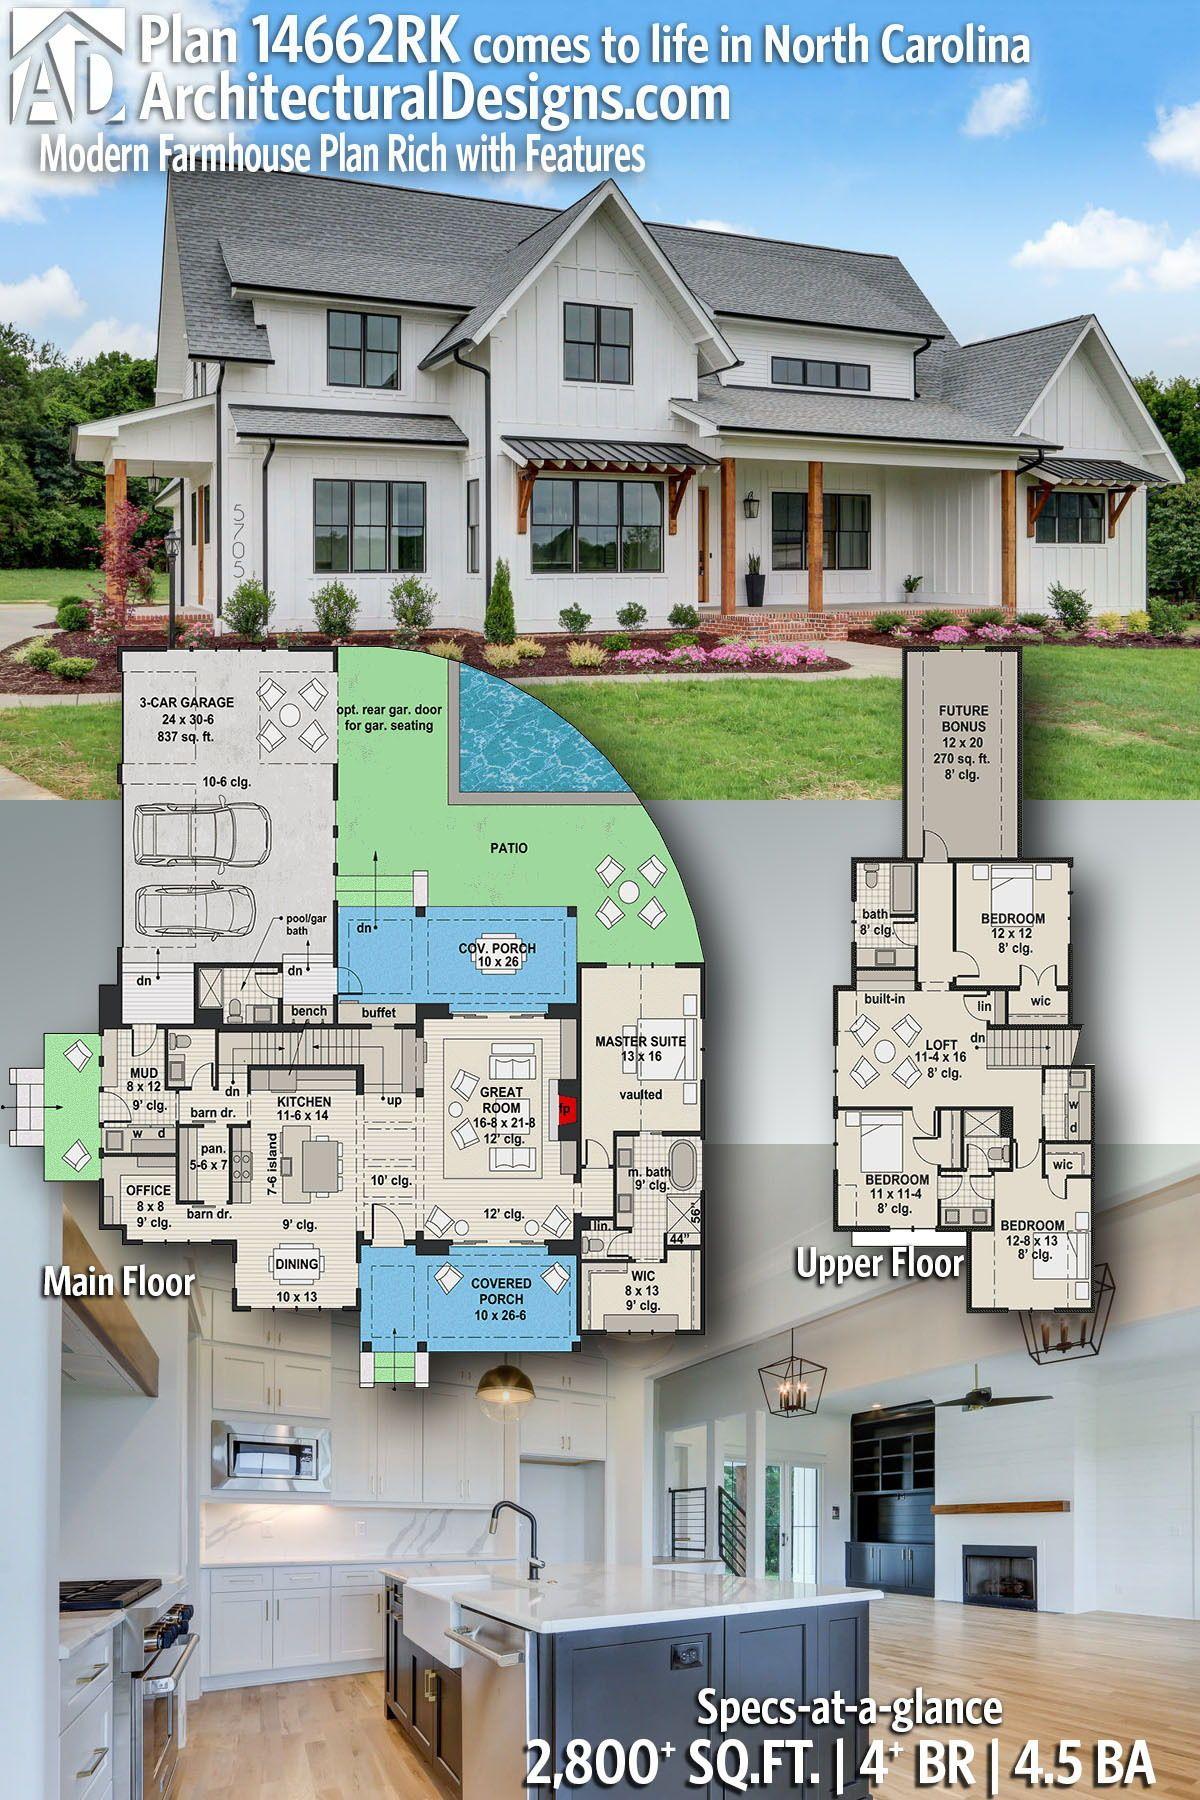 Plan 14662rk Modern Farmhouse Plan Rich With Features In 2020 Modern Farmhouse Plans Farmhouse Plans Dream House Plans